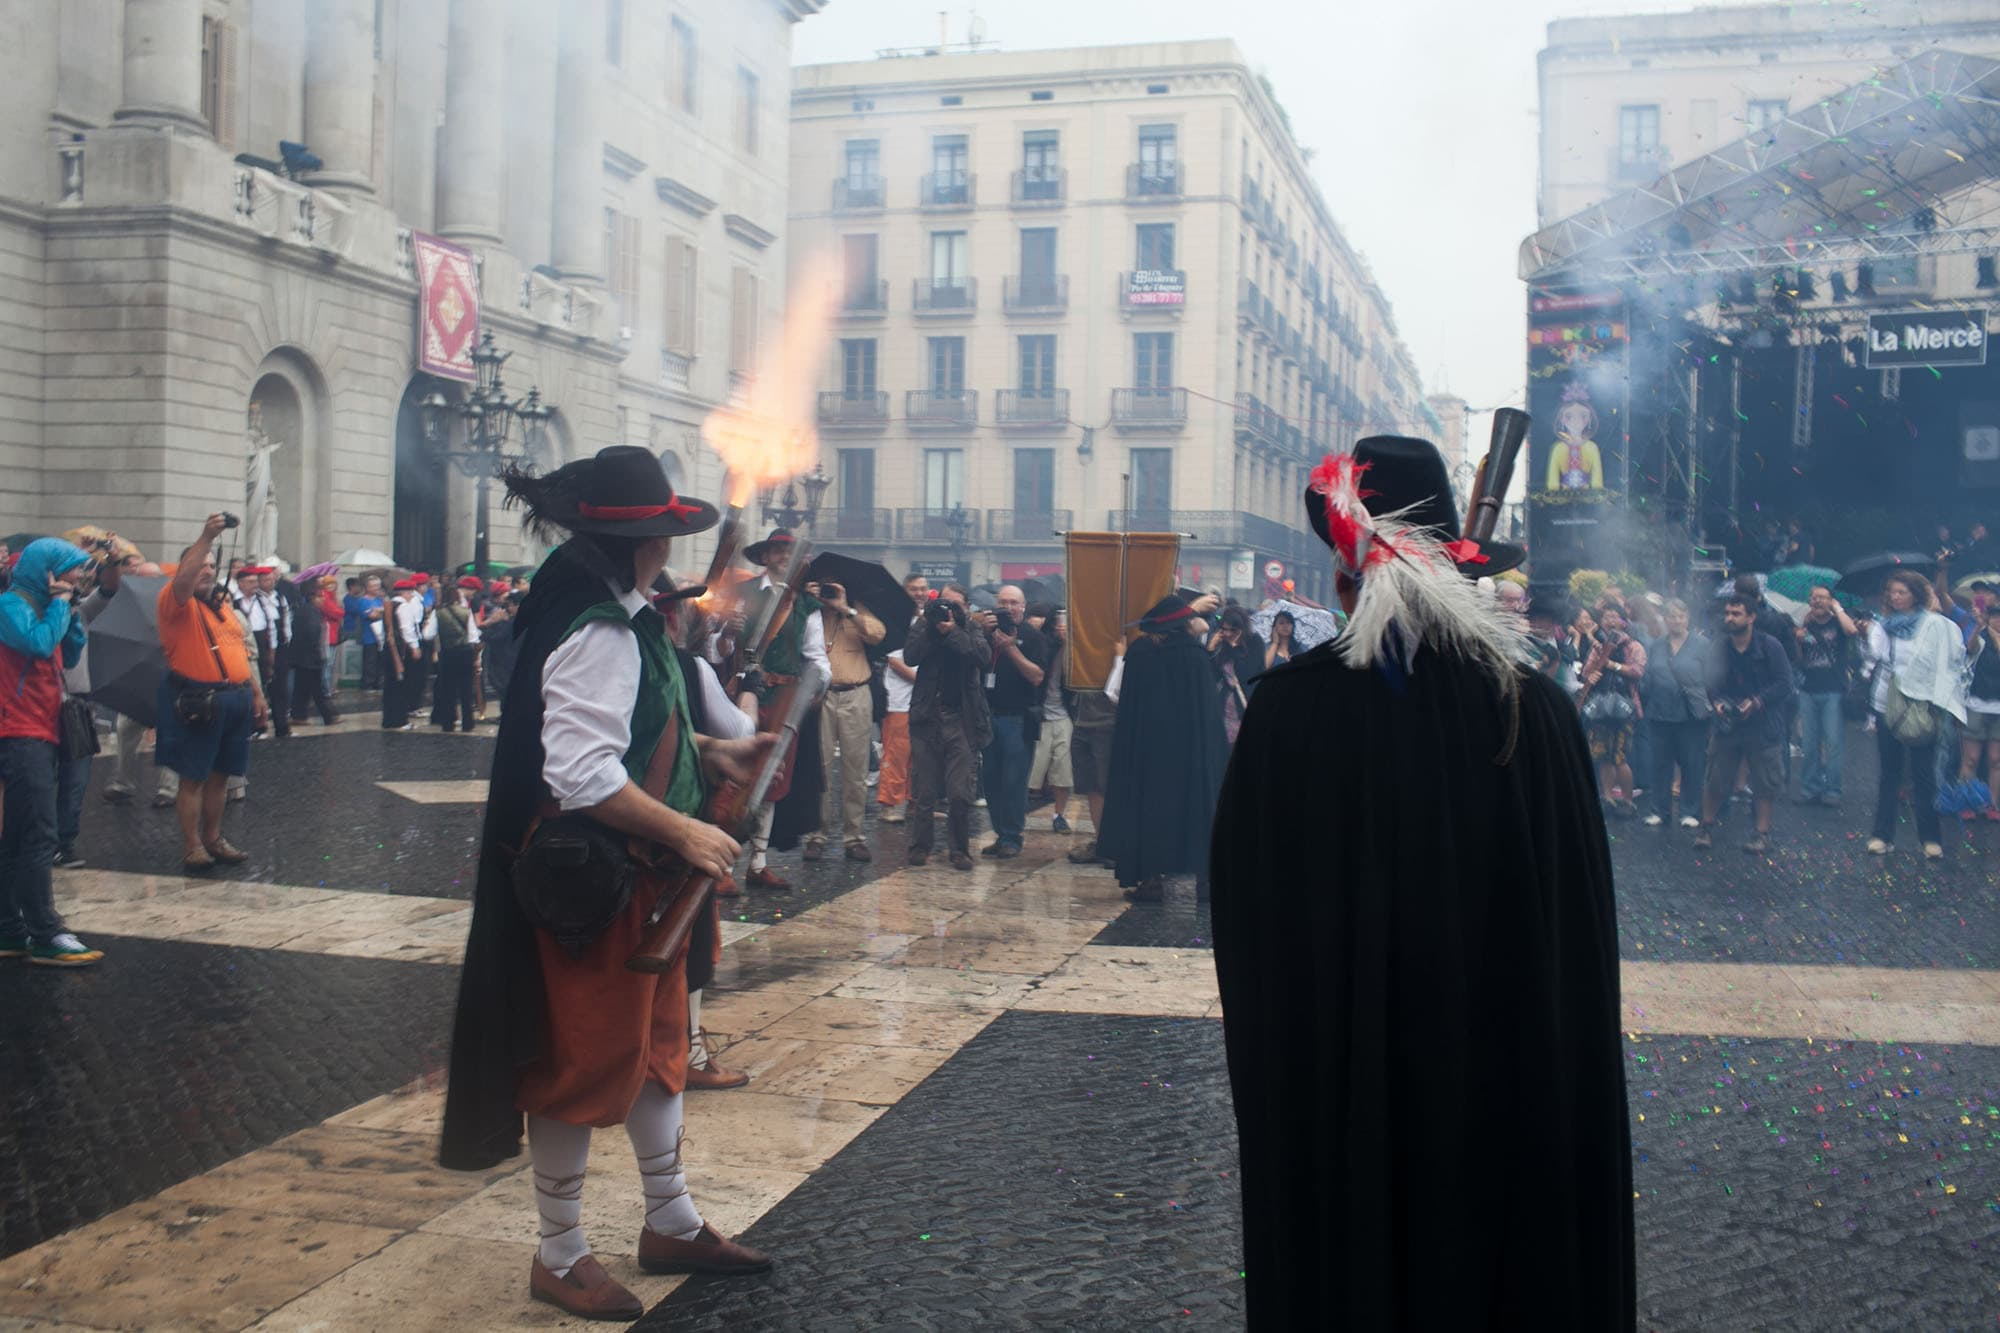 Gunshots wake up the square at La Mercè Festival in Barcelona, Spain